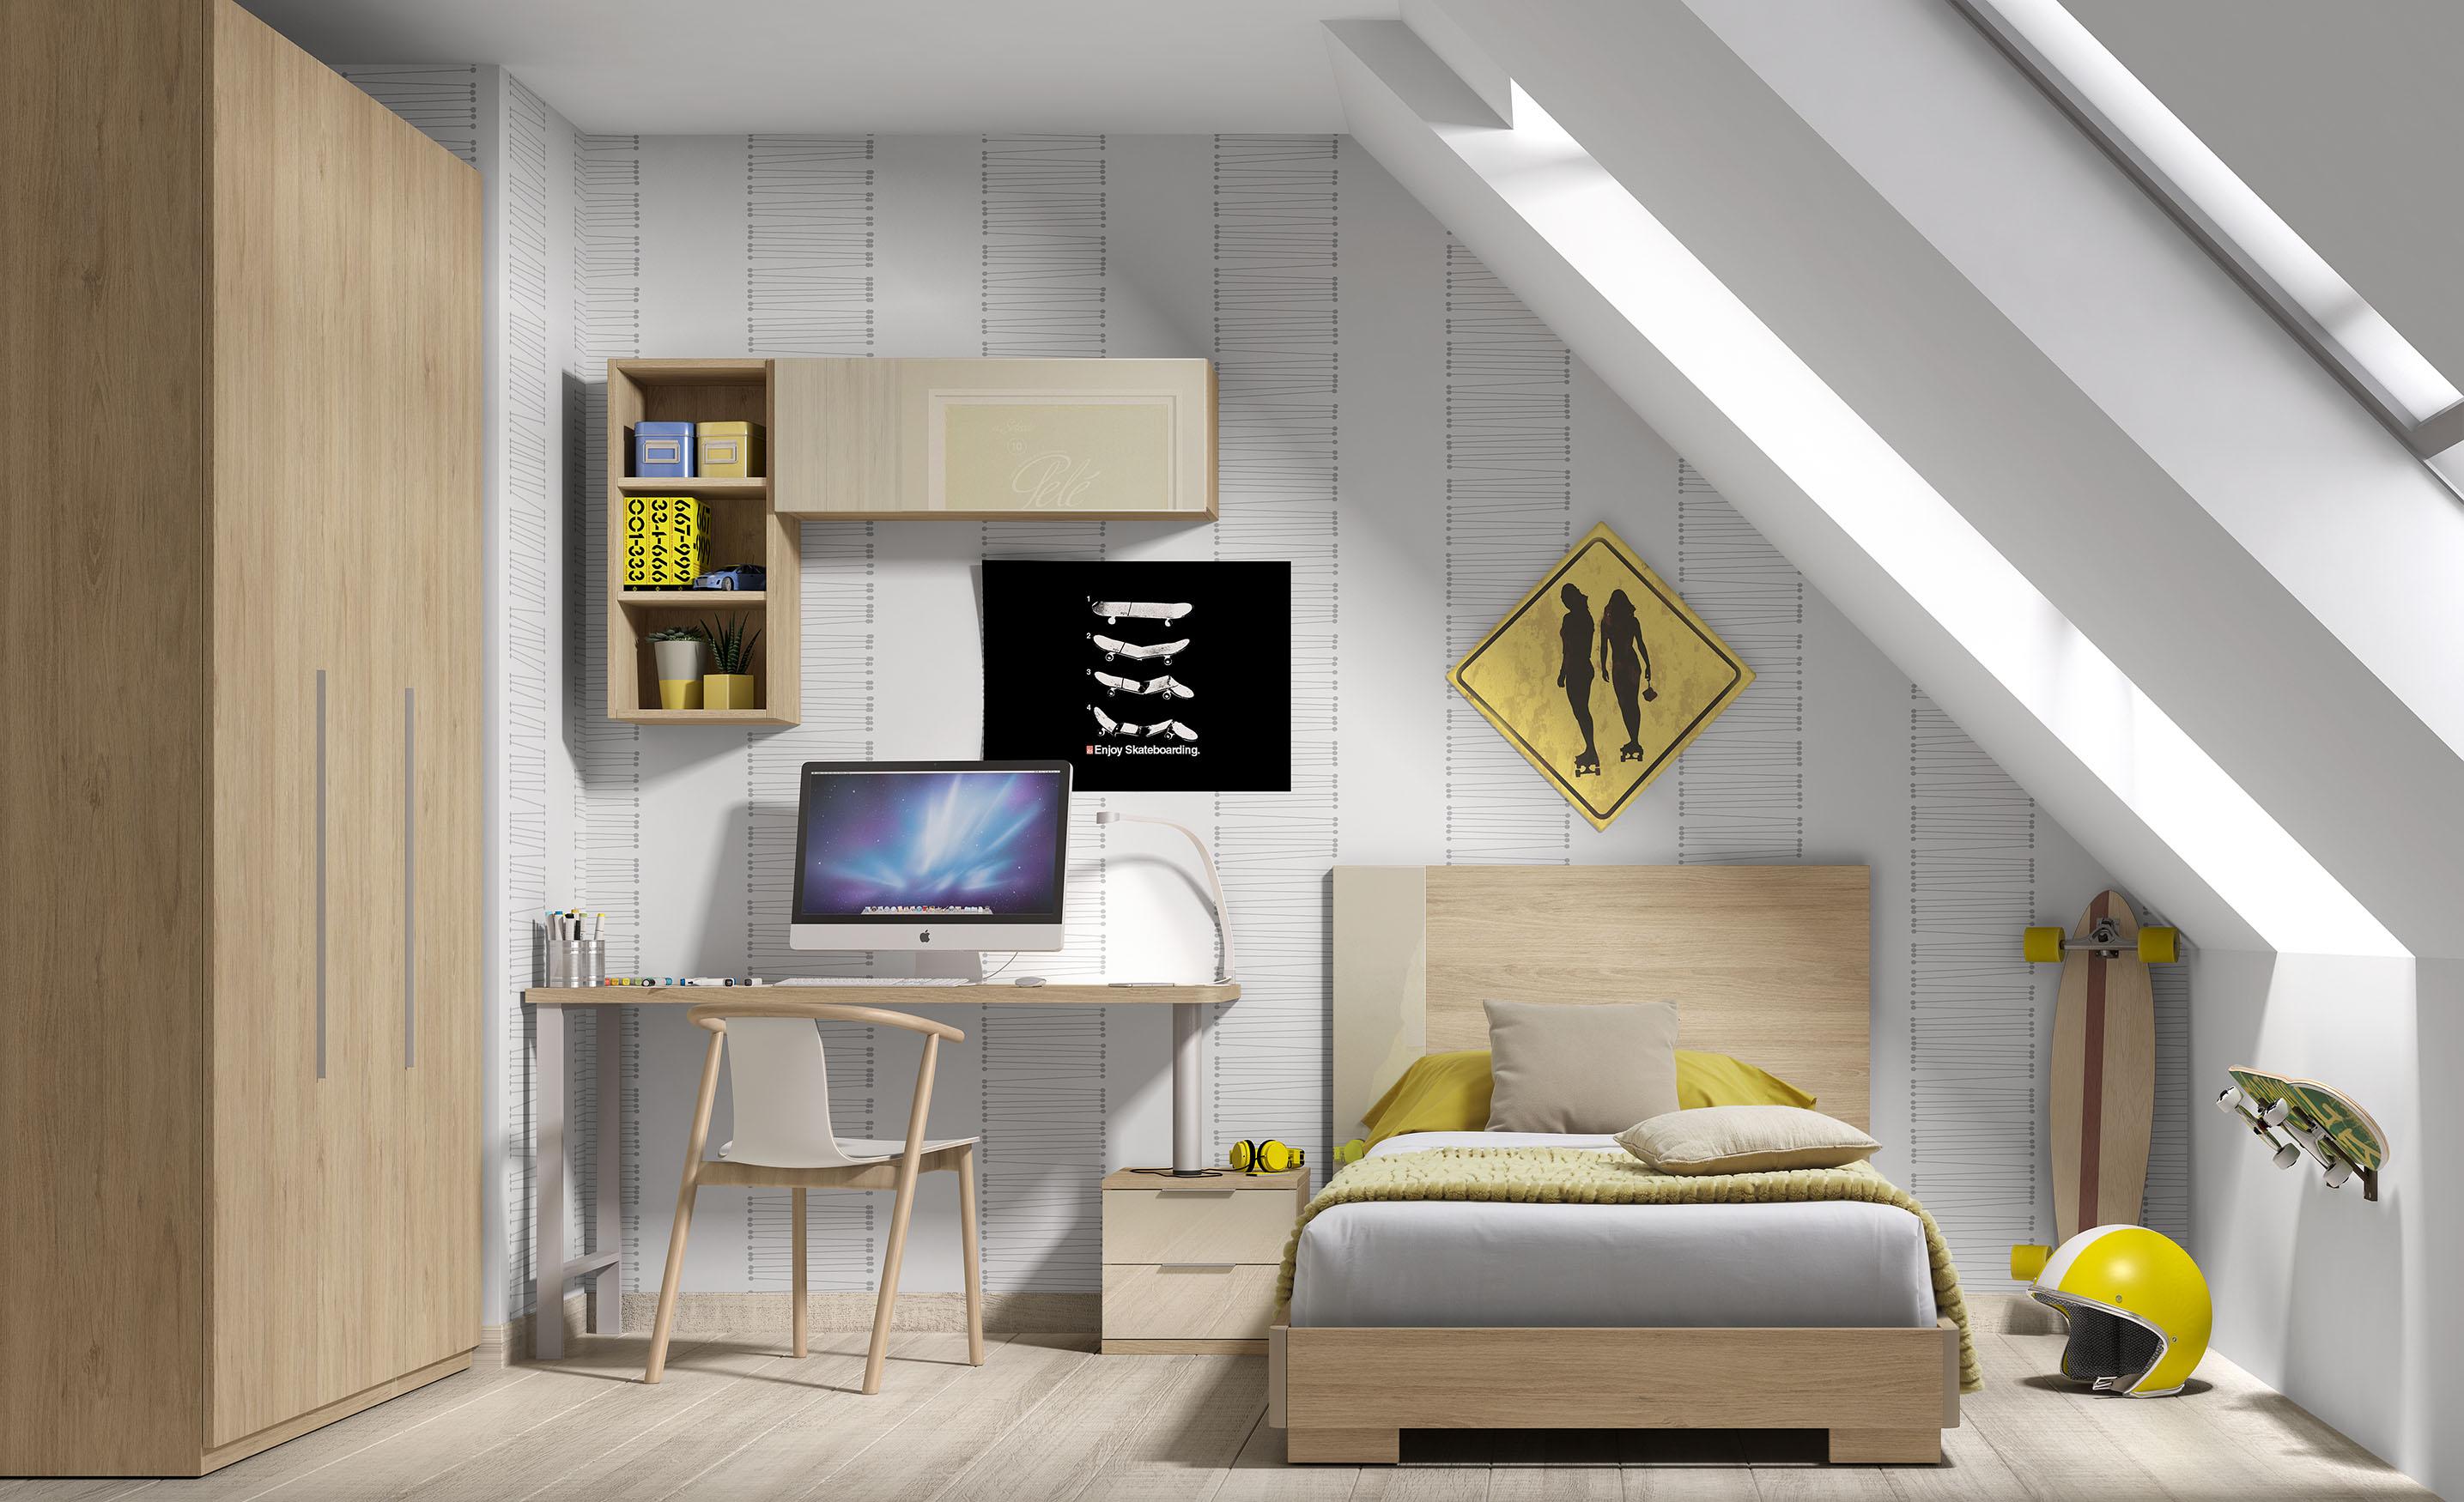 Dormitorio Juvenil Salu2 Ekki # Muebles Eki Hospitalet